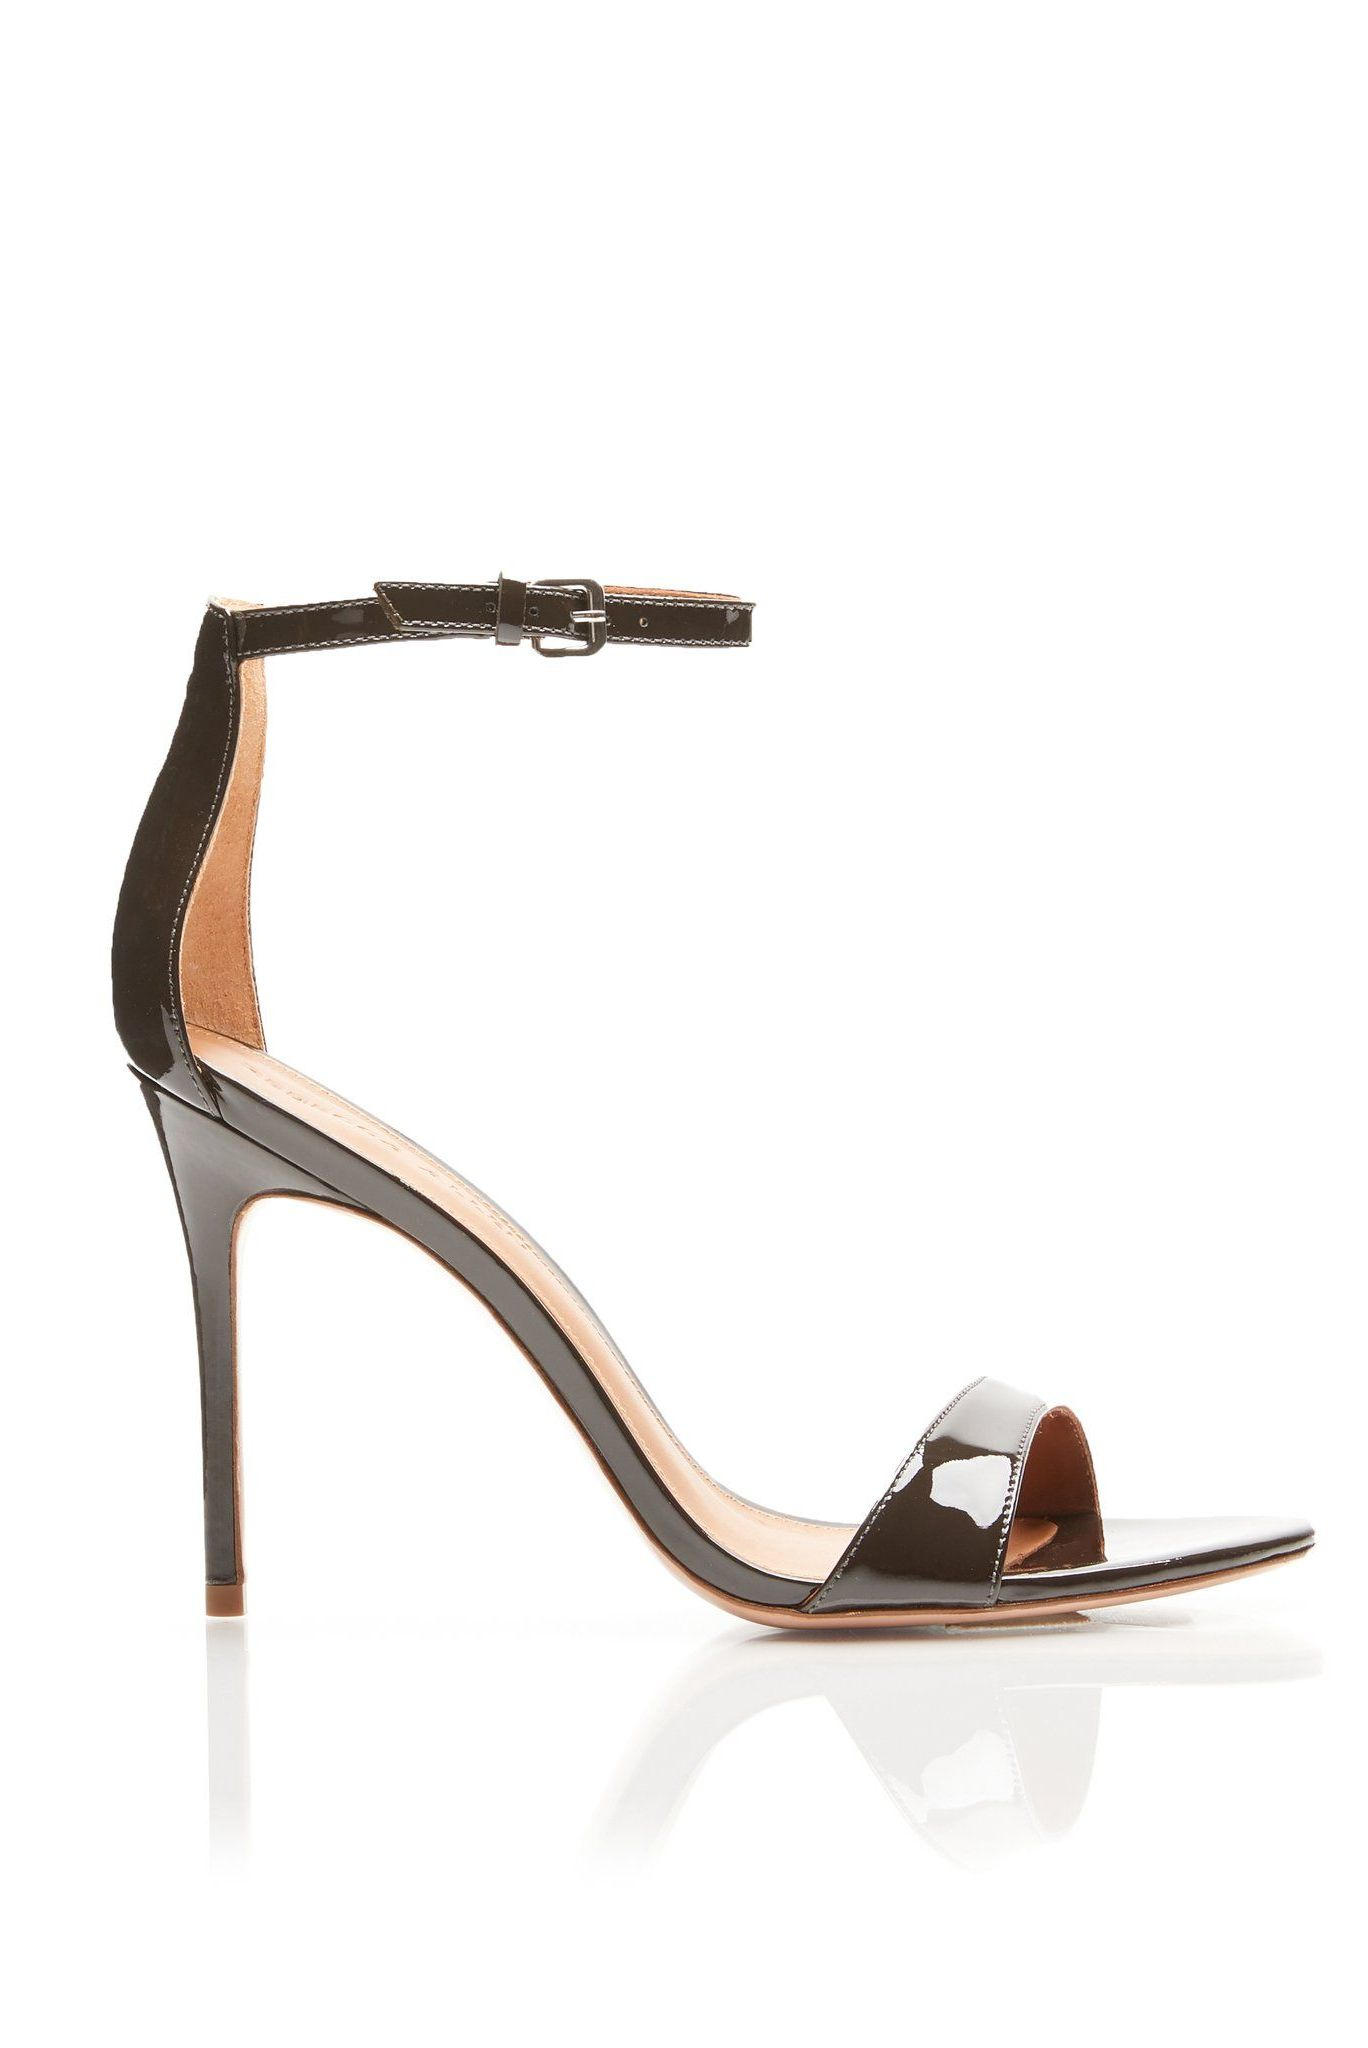 25 Most Comfortable High Heels 2020 Shop Best Comfy High Heels